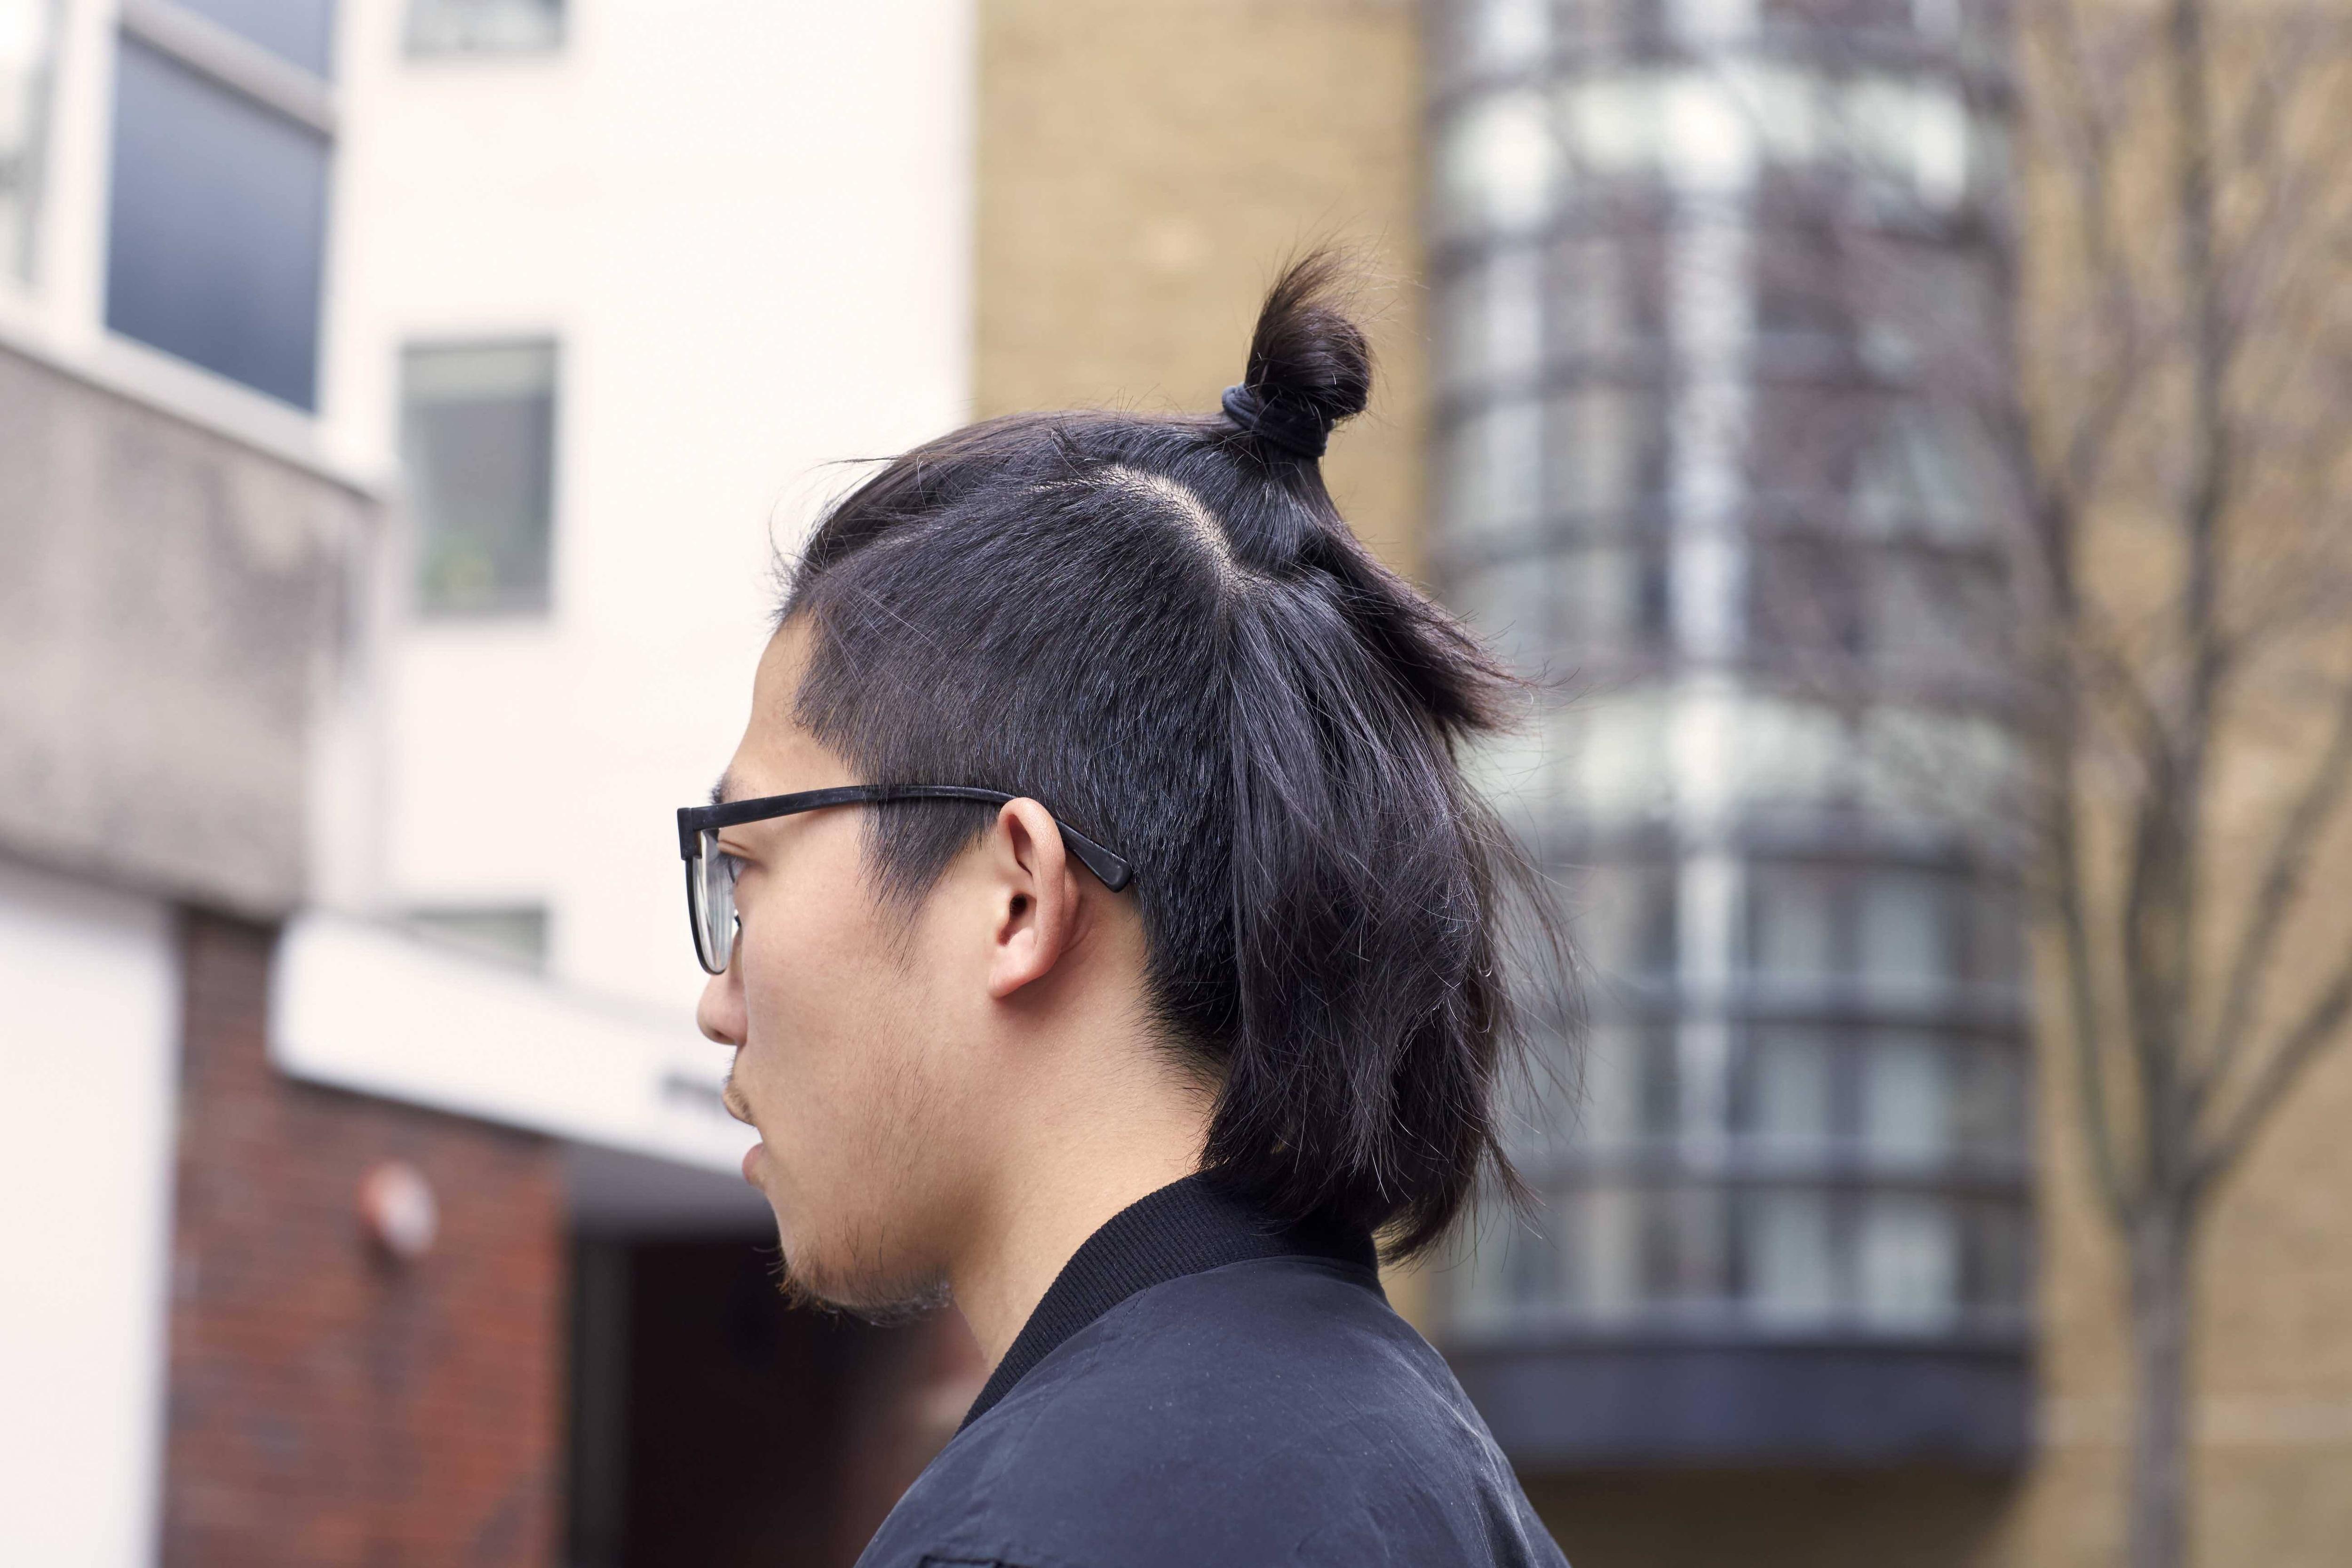 Mohwak hairstyle: Asian topknot mohawk